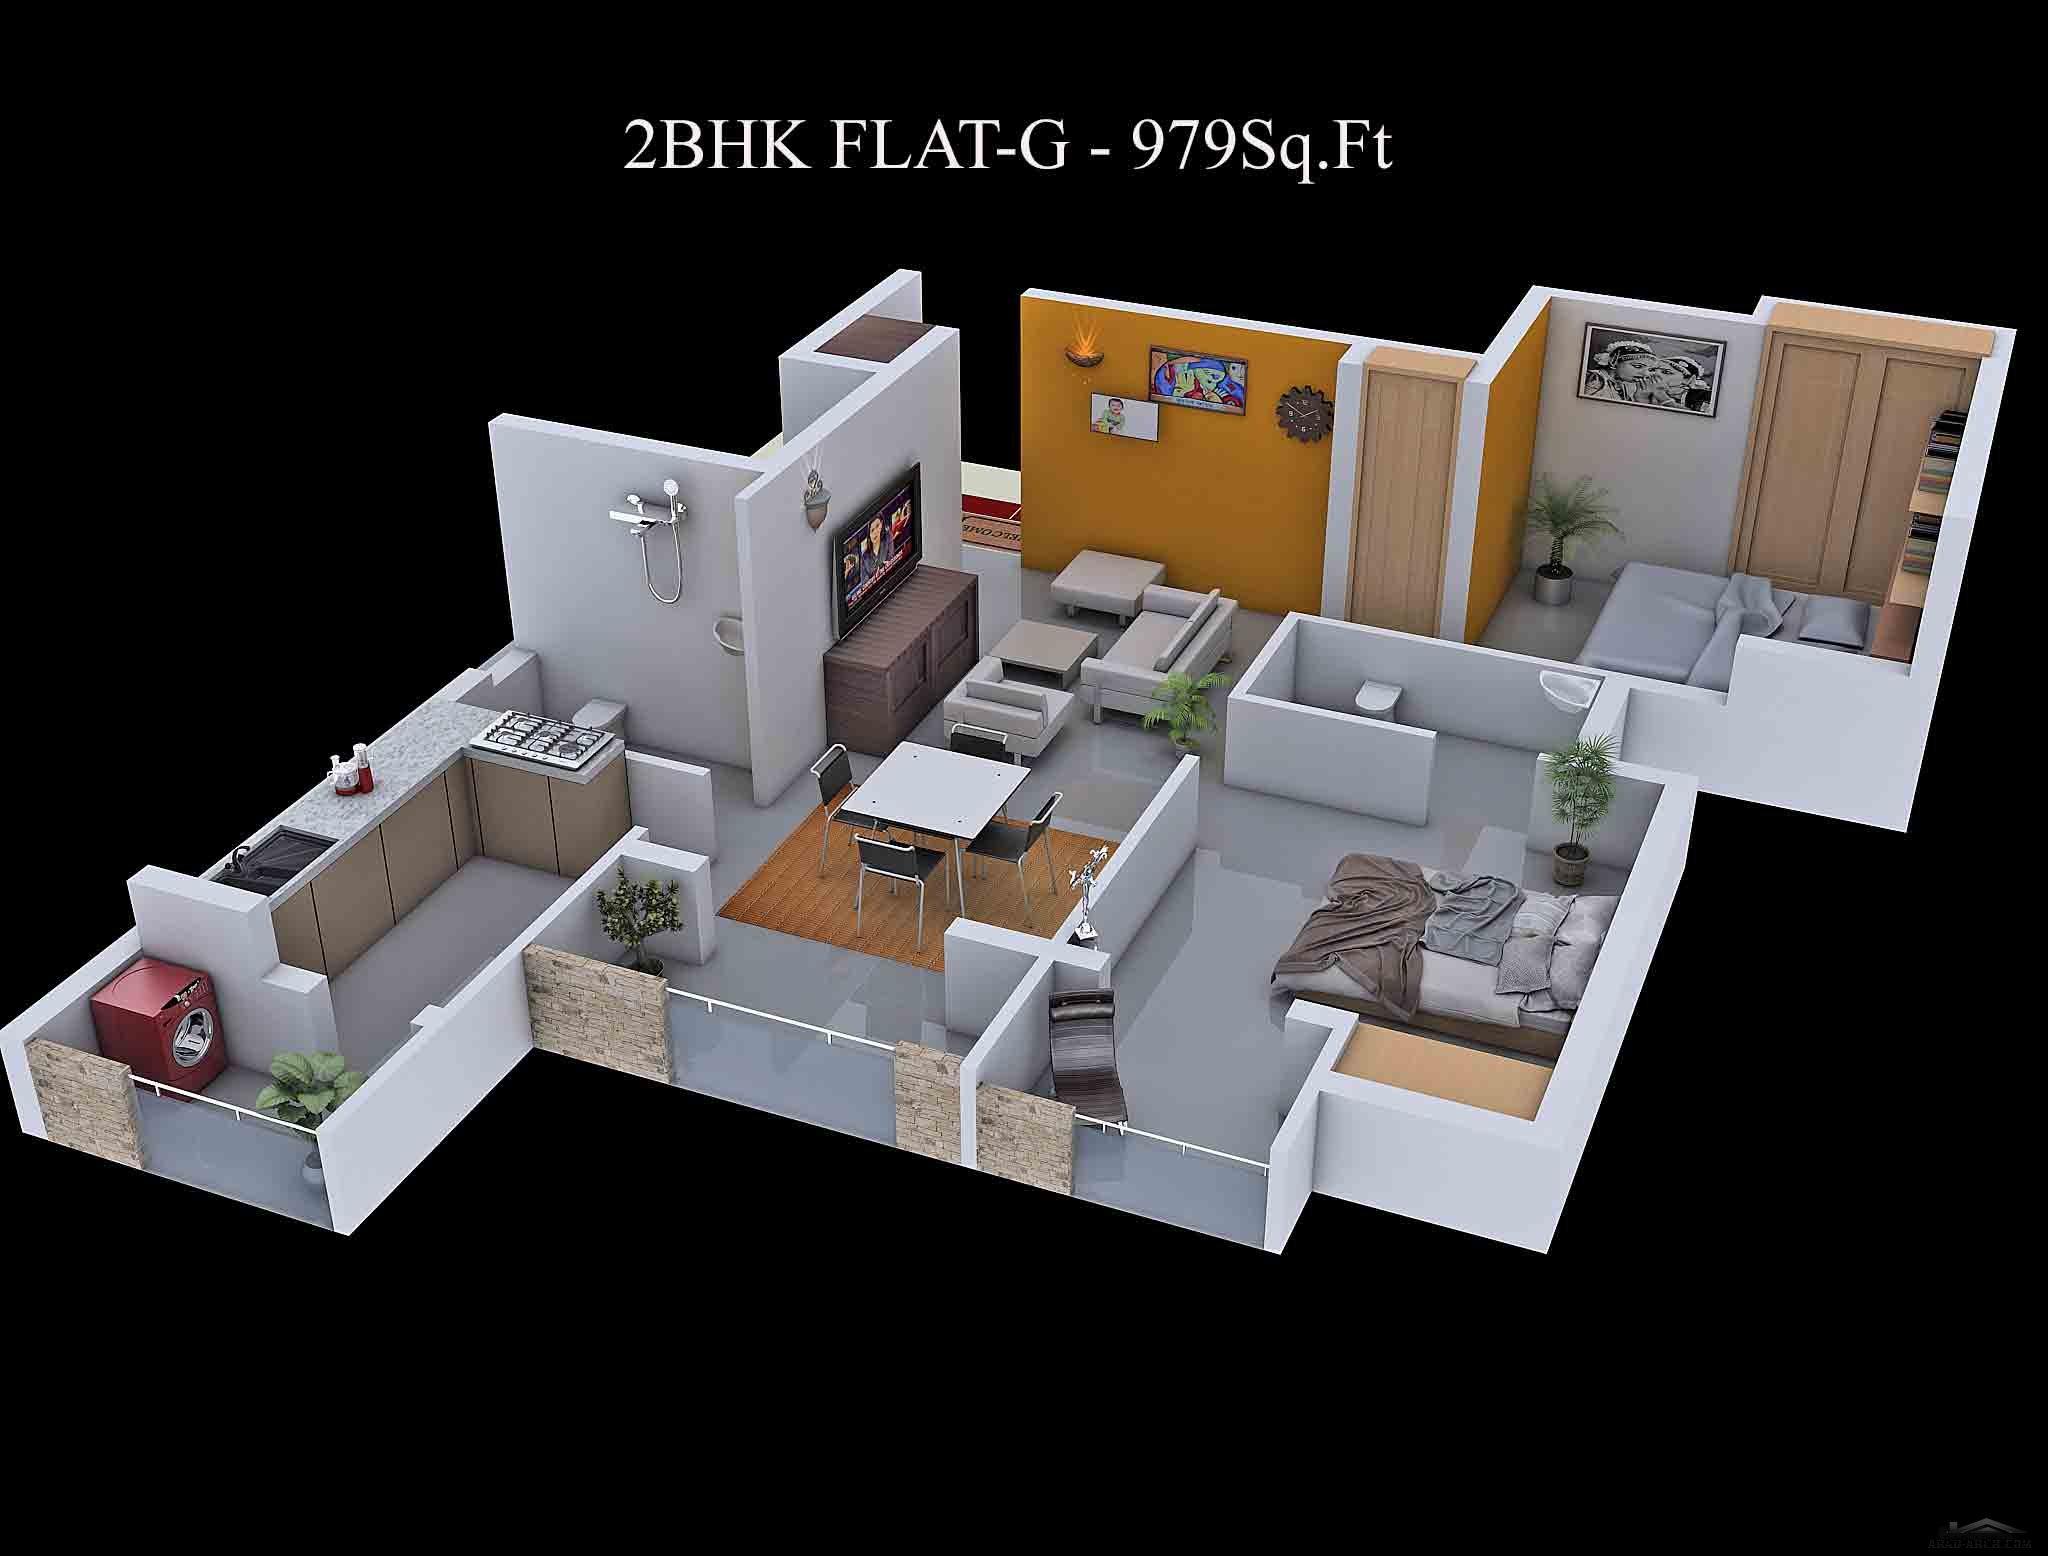 What Is Ots In Floor Plan عمارة مخطط الادوار 3d 187 Arab Arch